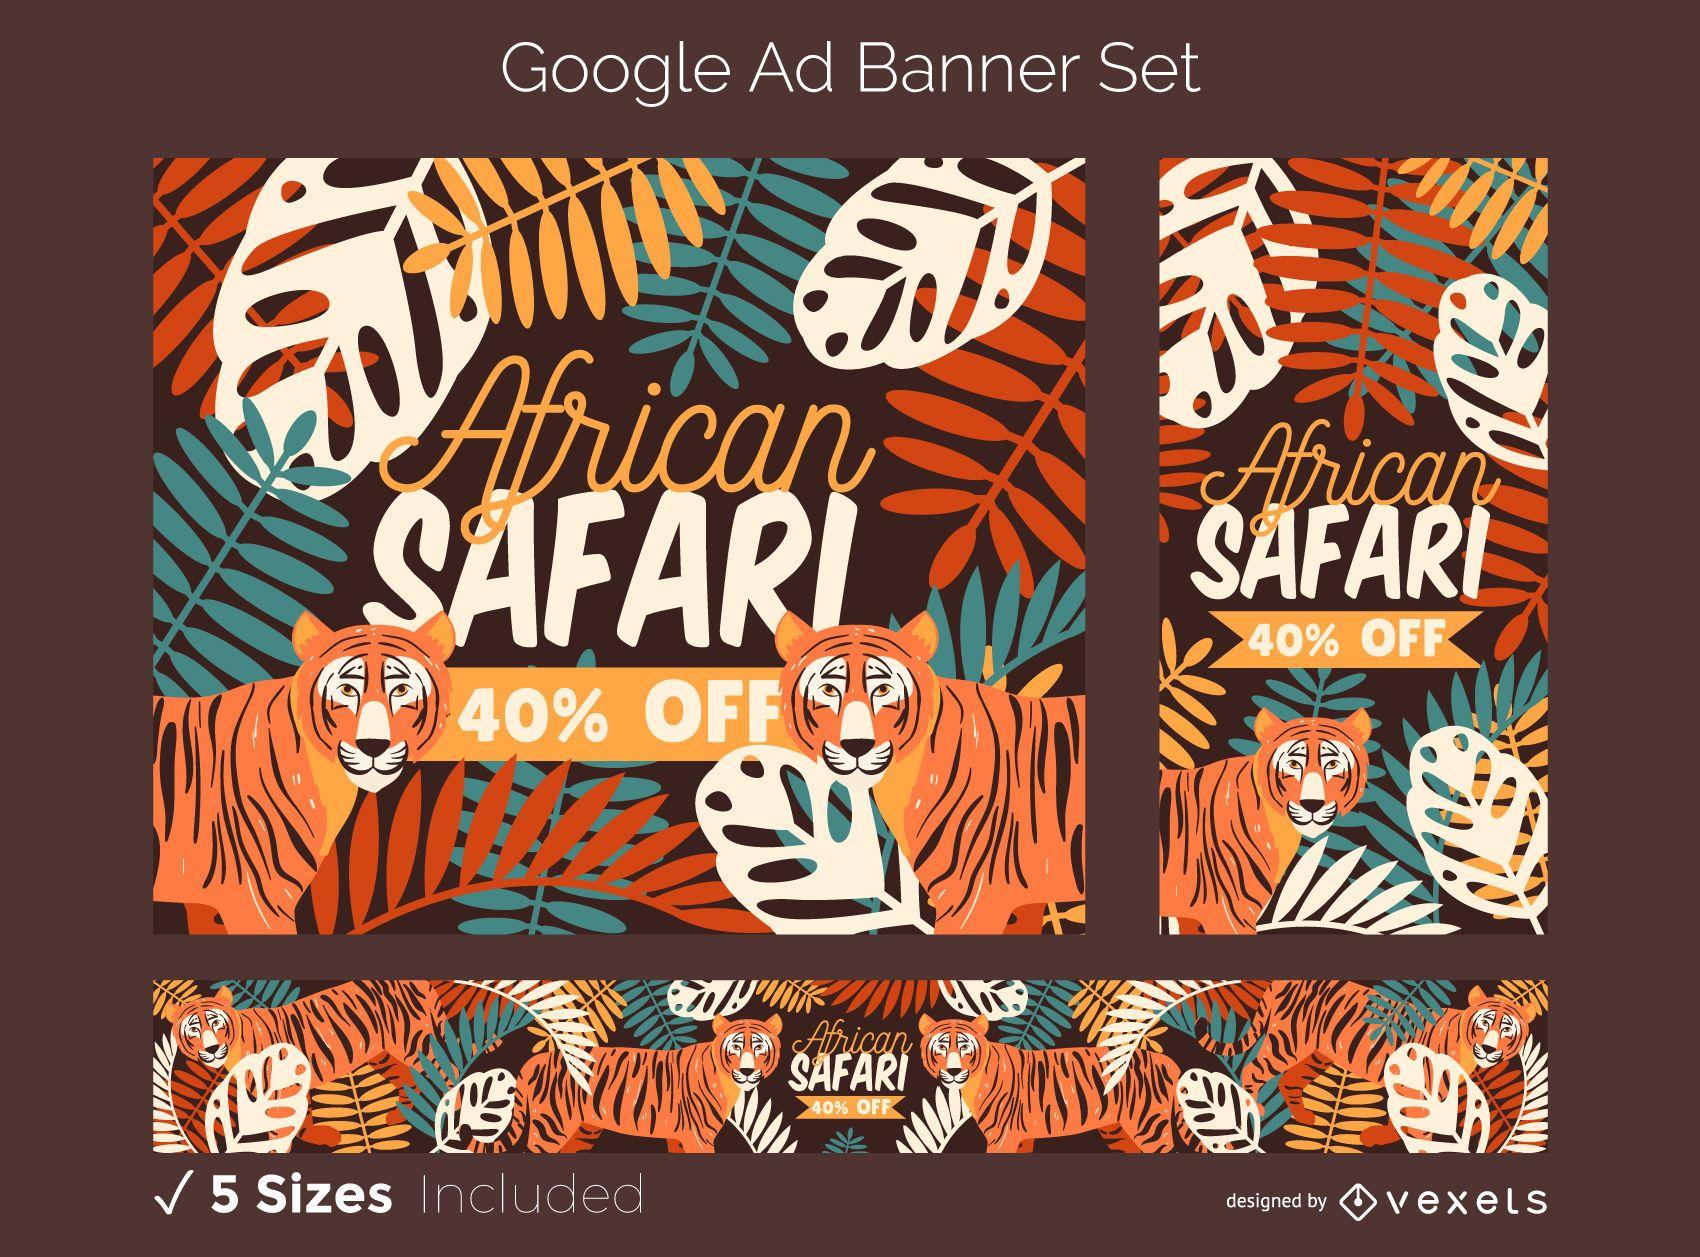 Conjunto de banners de anuncios de Google Safari africano